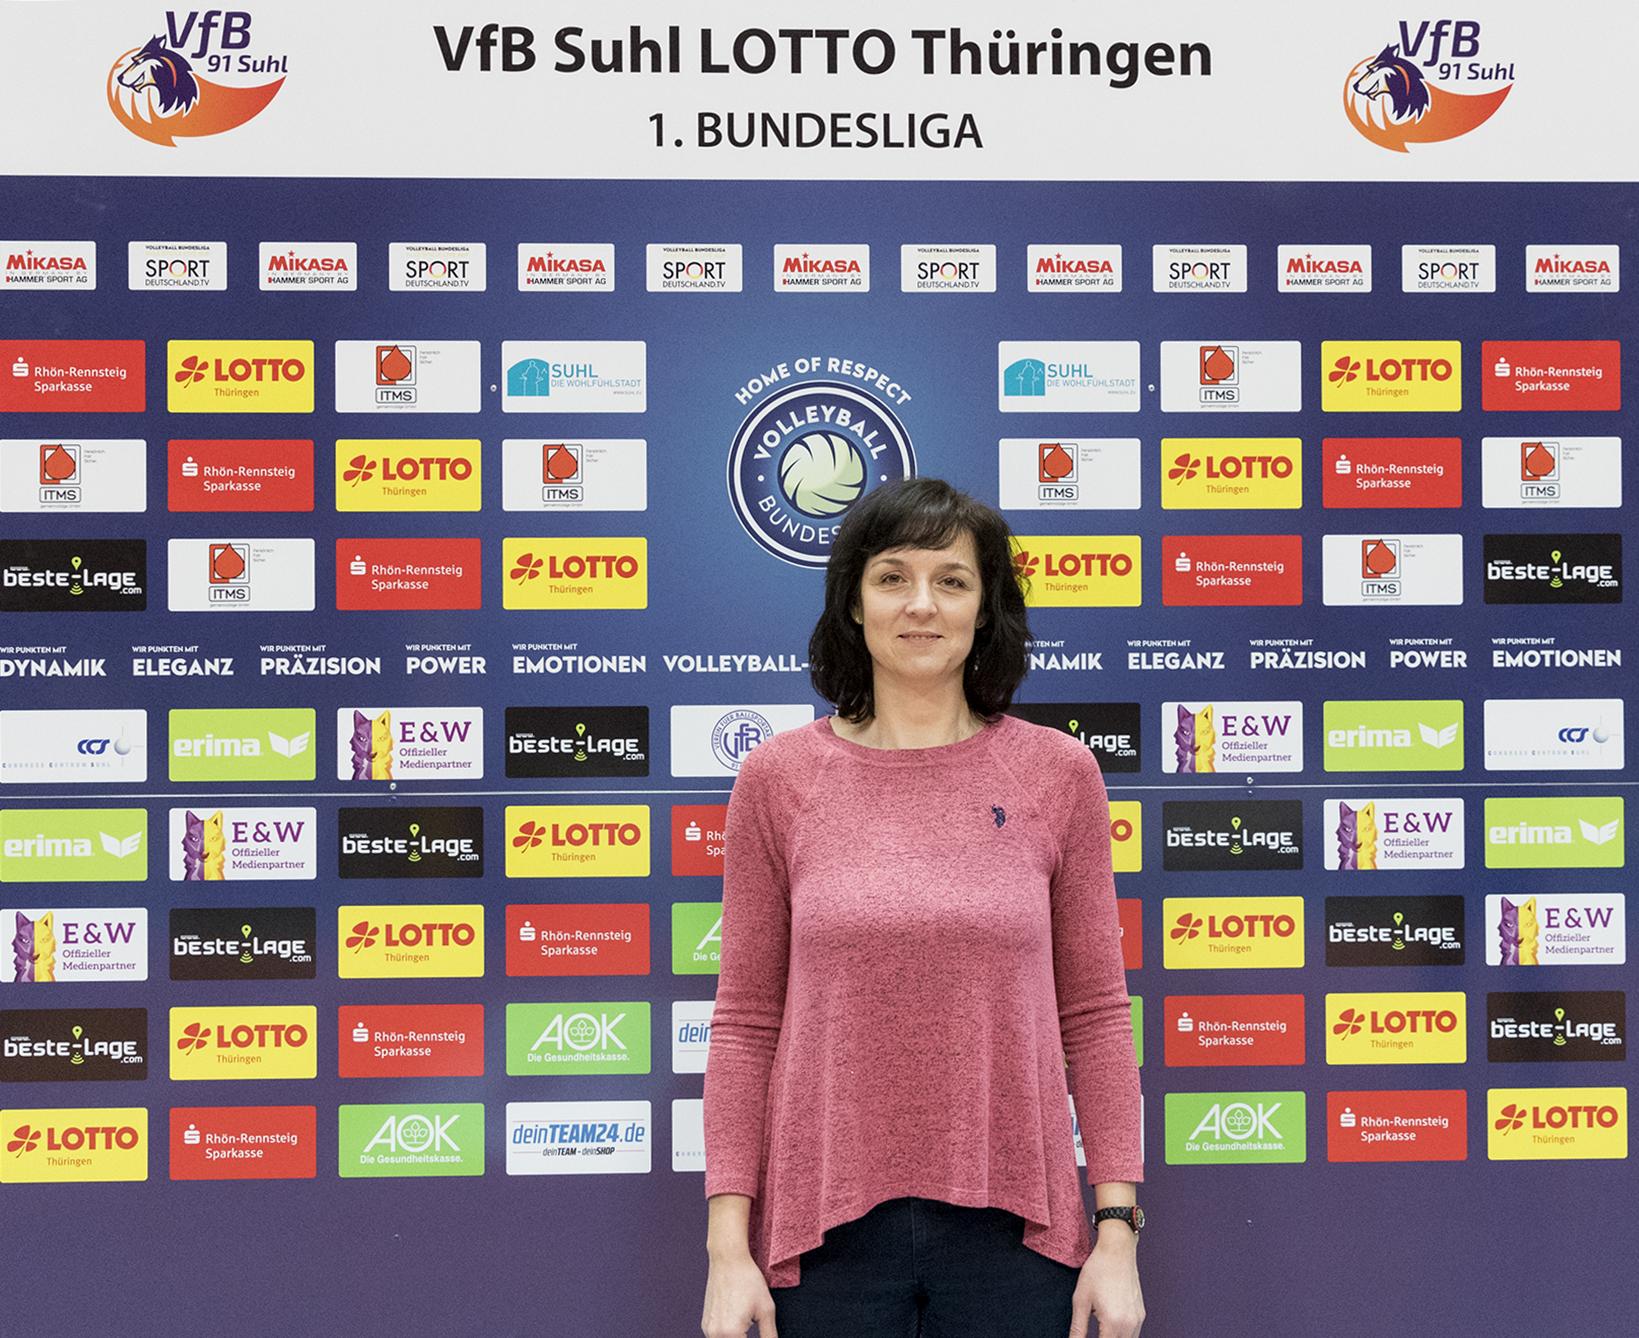 Annamaria Polgar - VfB-Projekt Volleyball macht Schule